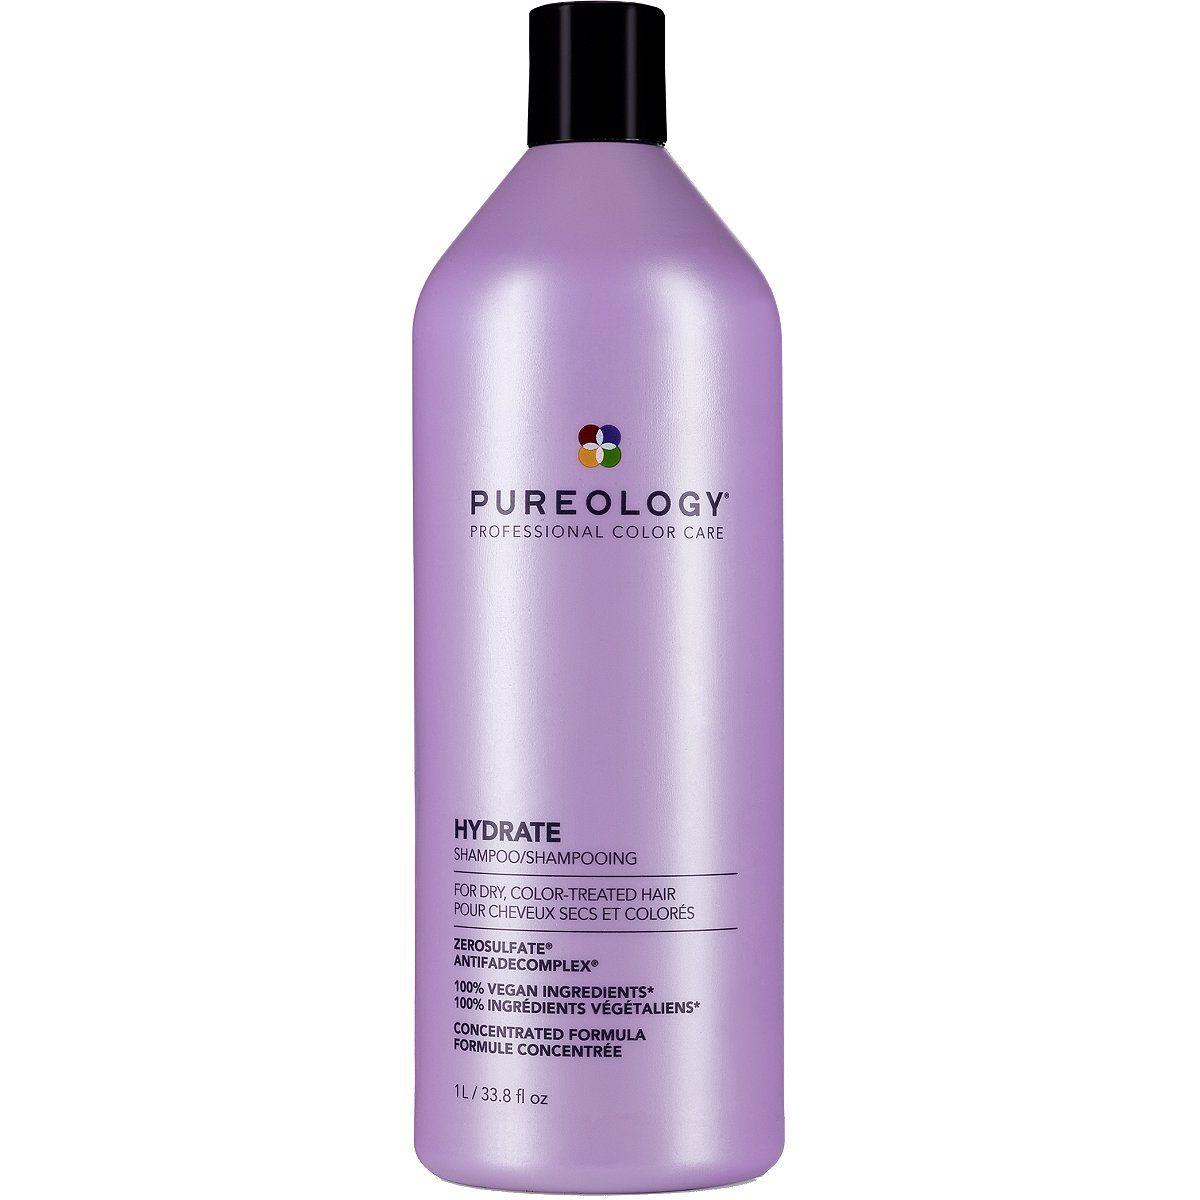 Pureology Hydrate Shampoo Ulta Beauty In 2021 Pureology Paraben Free Products Shampoo